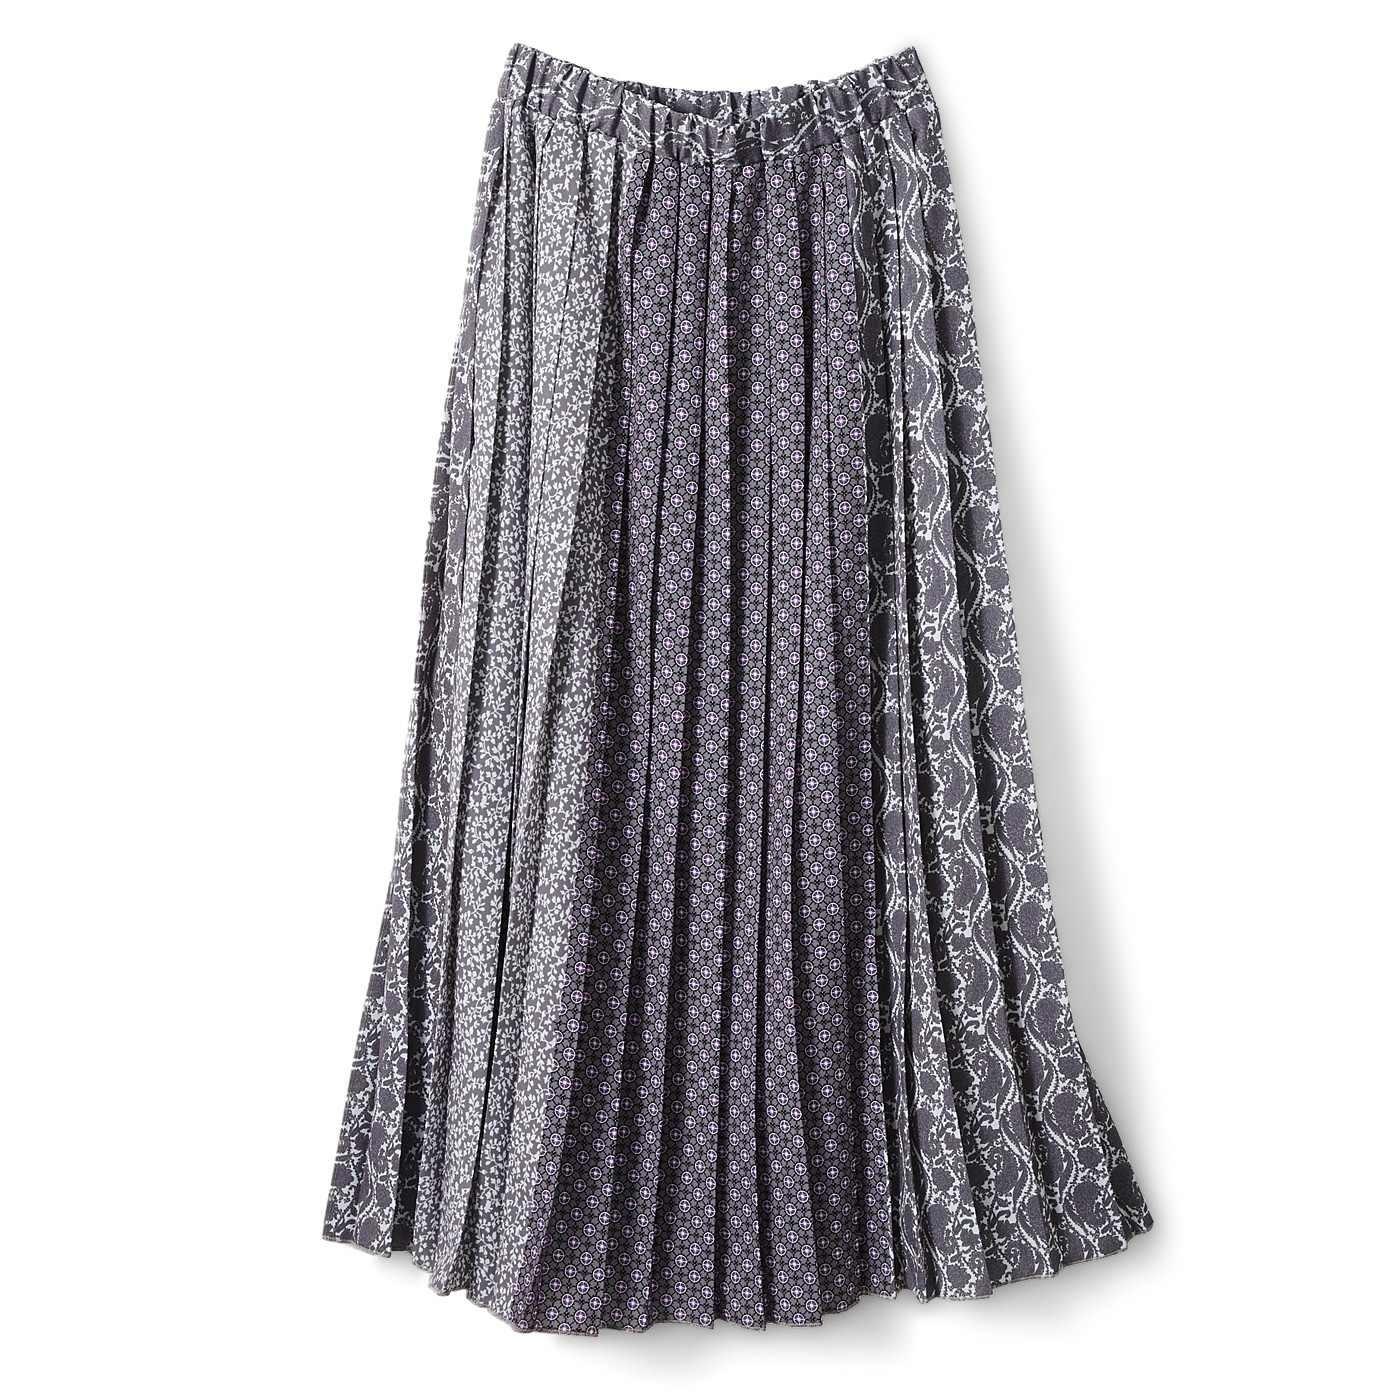 IEDIT[イディット] オリジナルプリントを組み合わせた ドラマチックなパネル柄 ロングプリーツスカート〈グレー〉